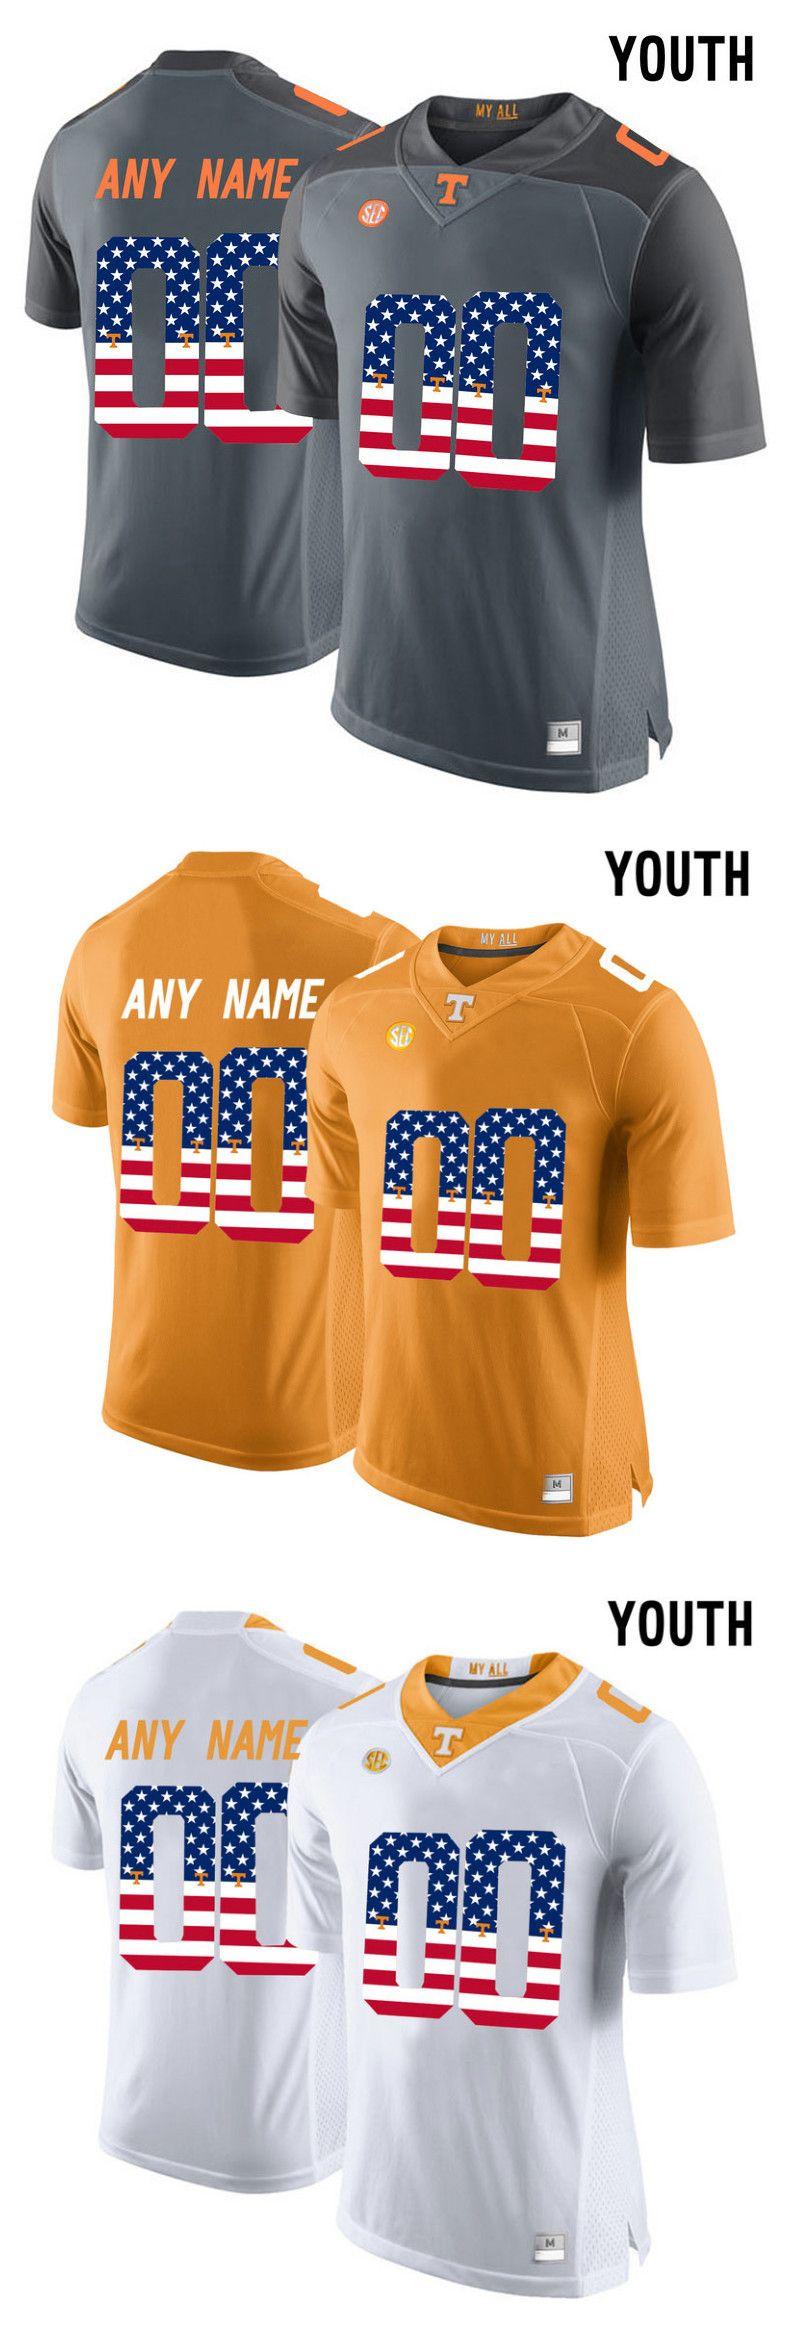 5f20a28a9 Youth 2017 US Flag Fashion Mens Tennessee Volunteers Customized Kids Boys  Children Men Custom Mens Tennessee Volunteers College Football Limited  orange ...